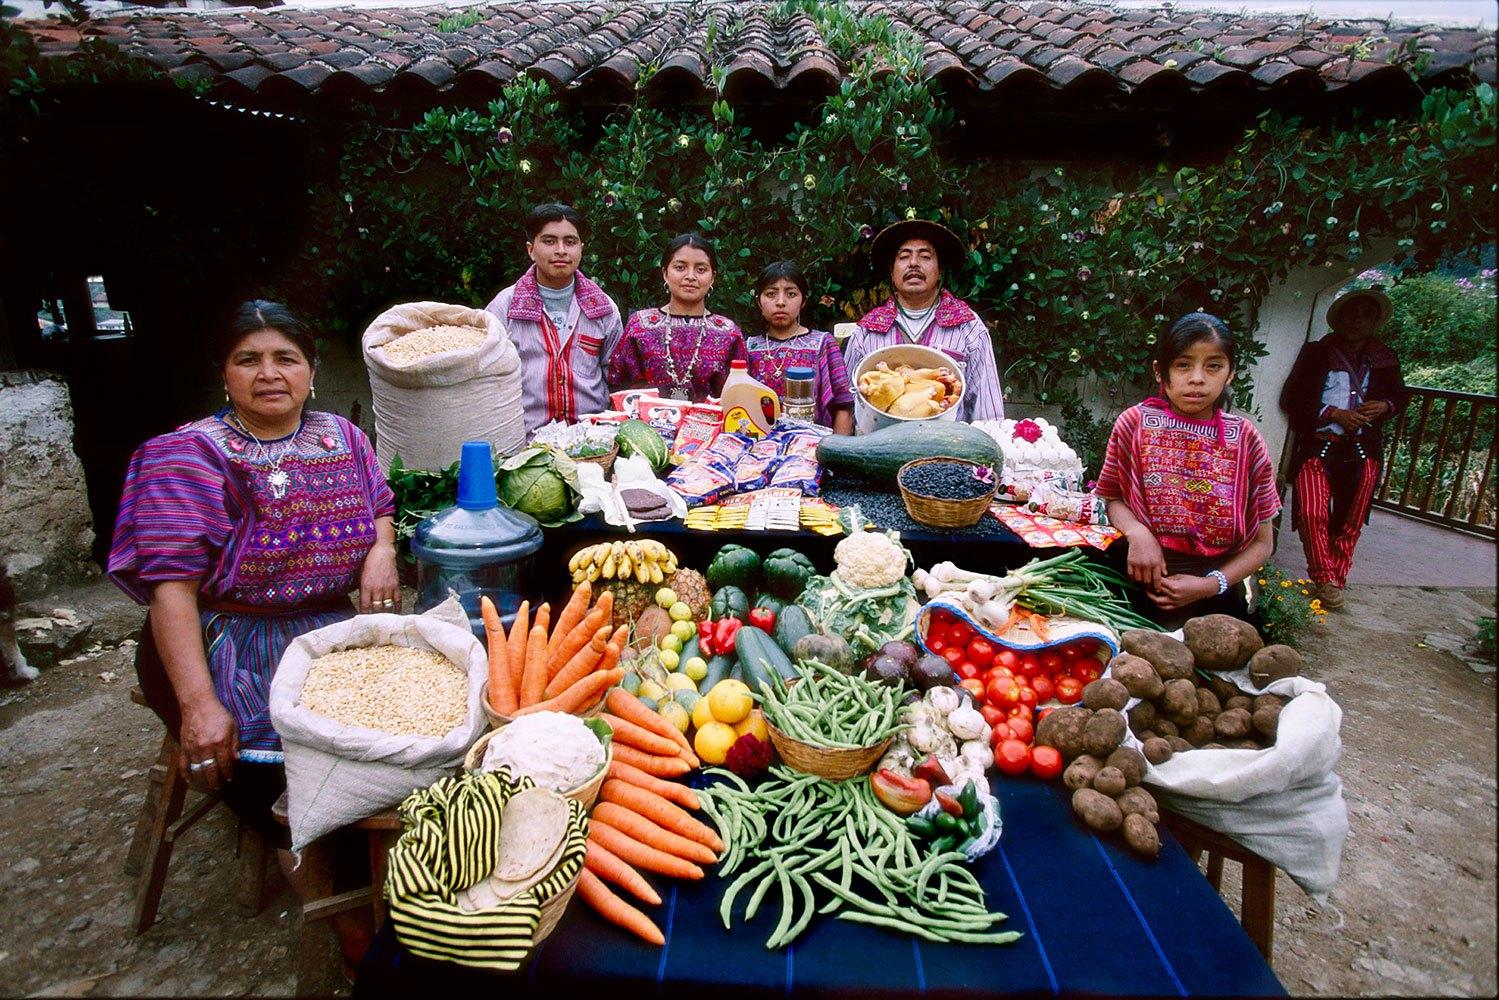 Guatemala: The Mendozas of Todos Santos - Food expenditure for one week: 573 Quetzales or $75.70. Family Recipe: Turkey Stew and Susana Perez Matias's Sheep Soup.